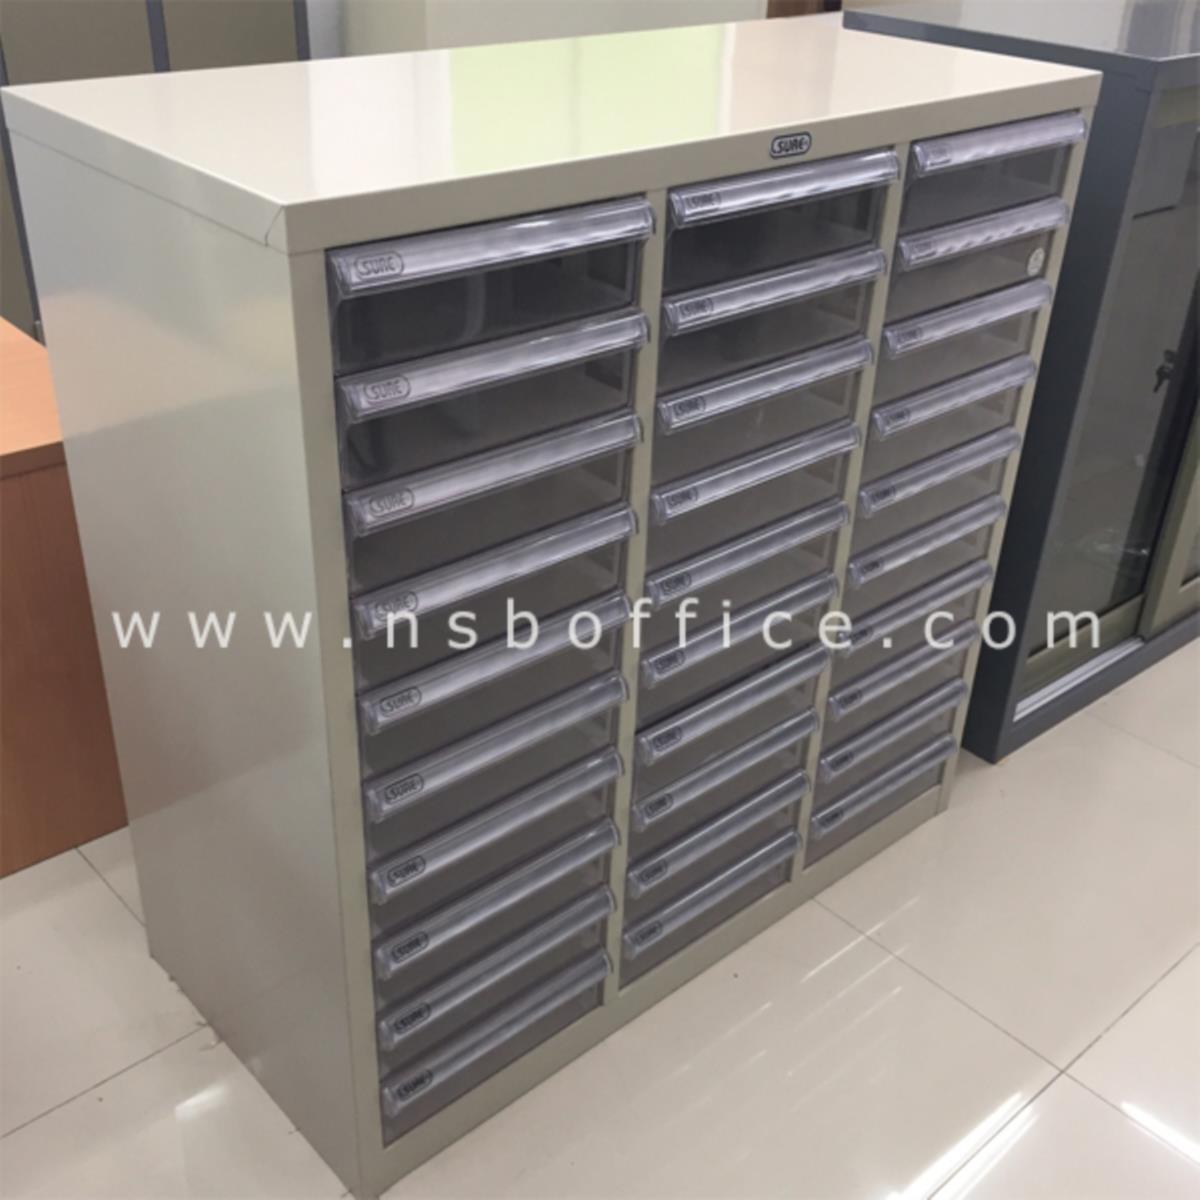 E04A031:ตู้เหล็กเก็บเอกสาร 30 ลิ้นชักใหญ่ (เก็บแบบฟอร์มแยกประเภท) 88W*40.7D*88H cm. รุ่น SD-302